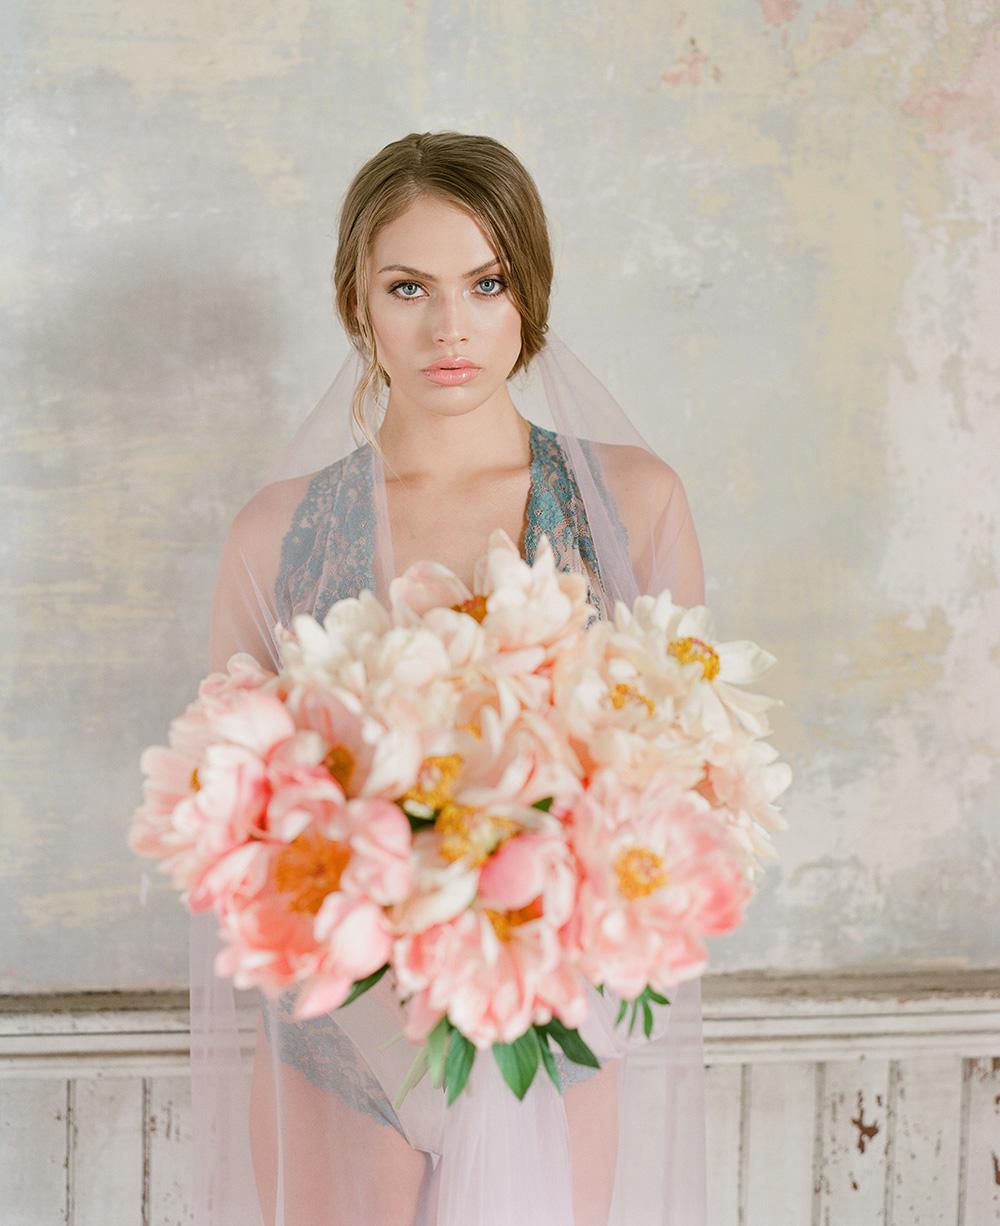 Sara Donaldson_Celedon Style_Artfully Framed WEB_0032.jpg